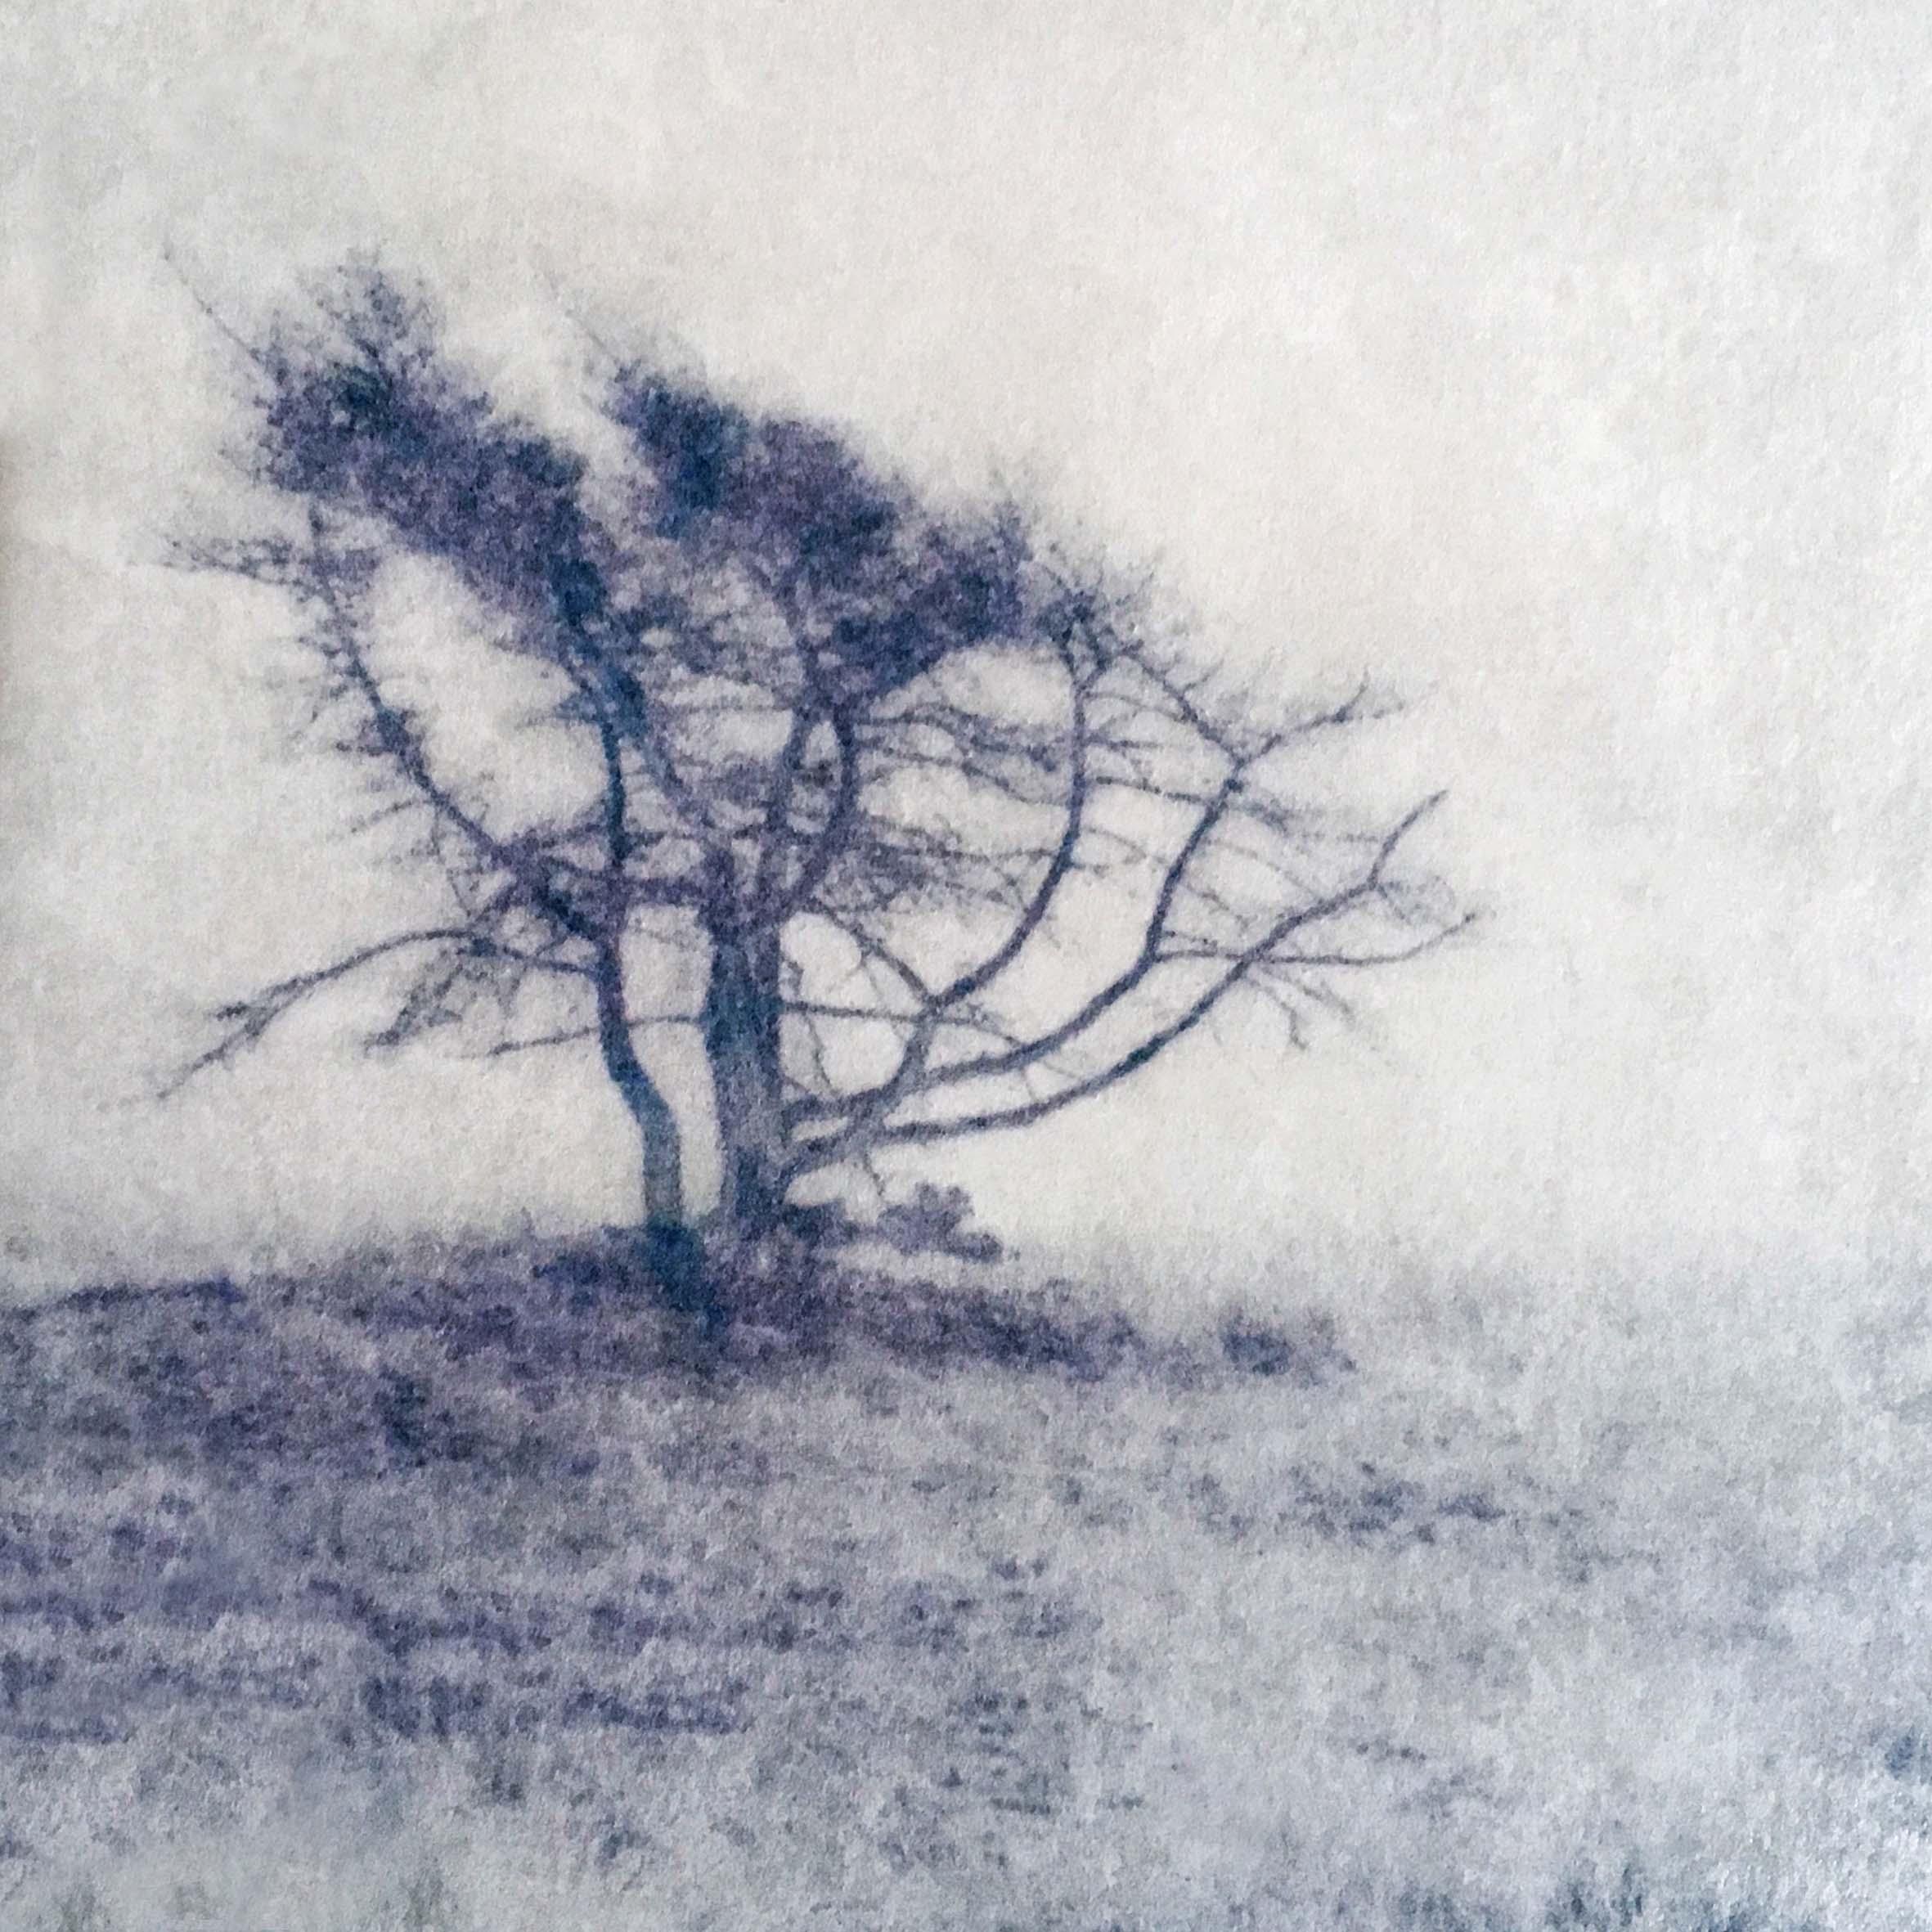 Solitude III_KarenWinnubstFotografie_LR.